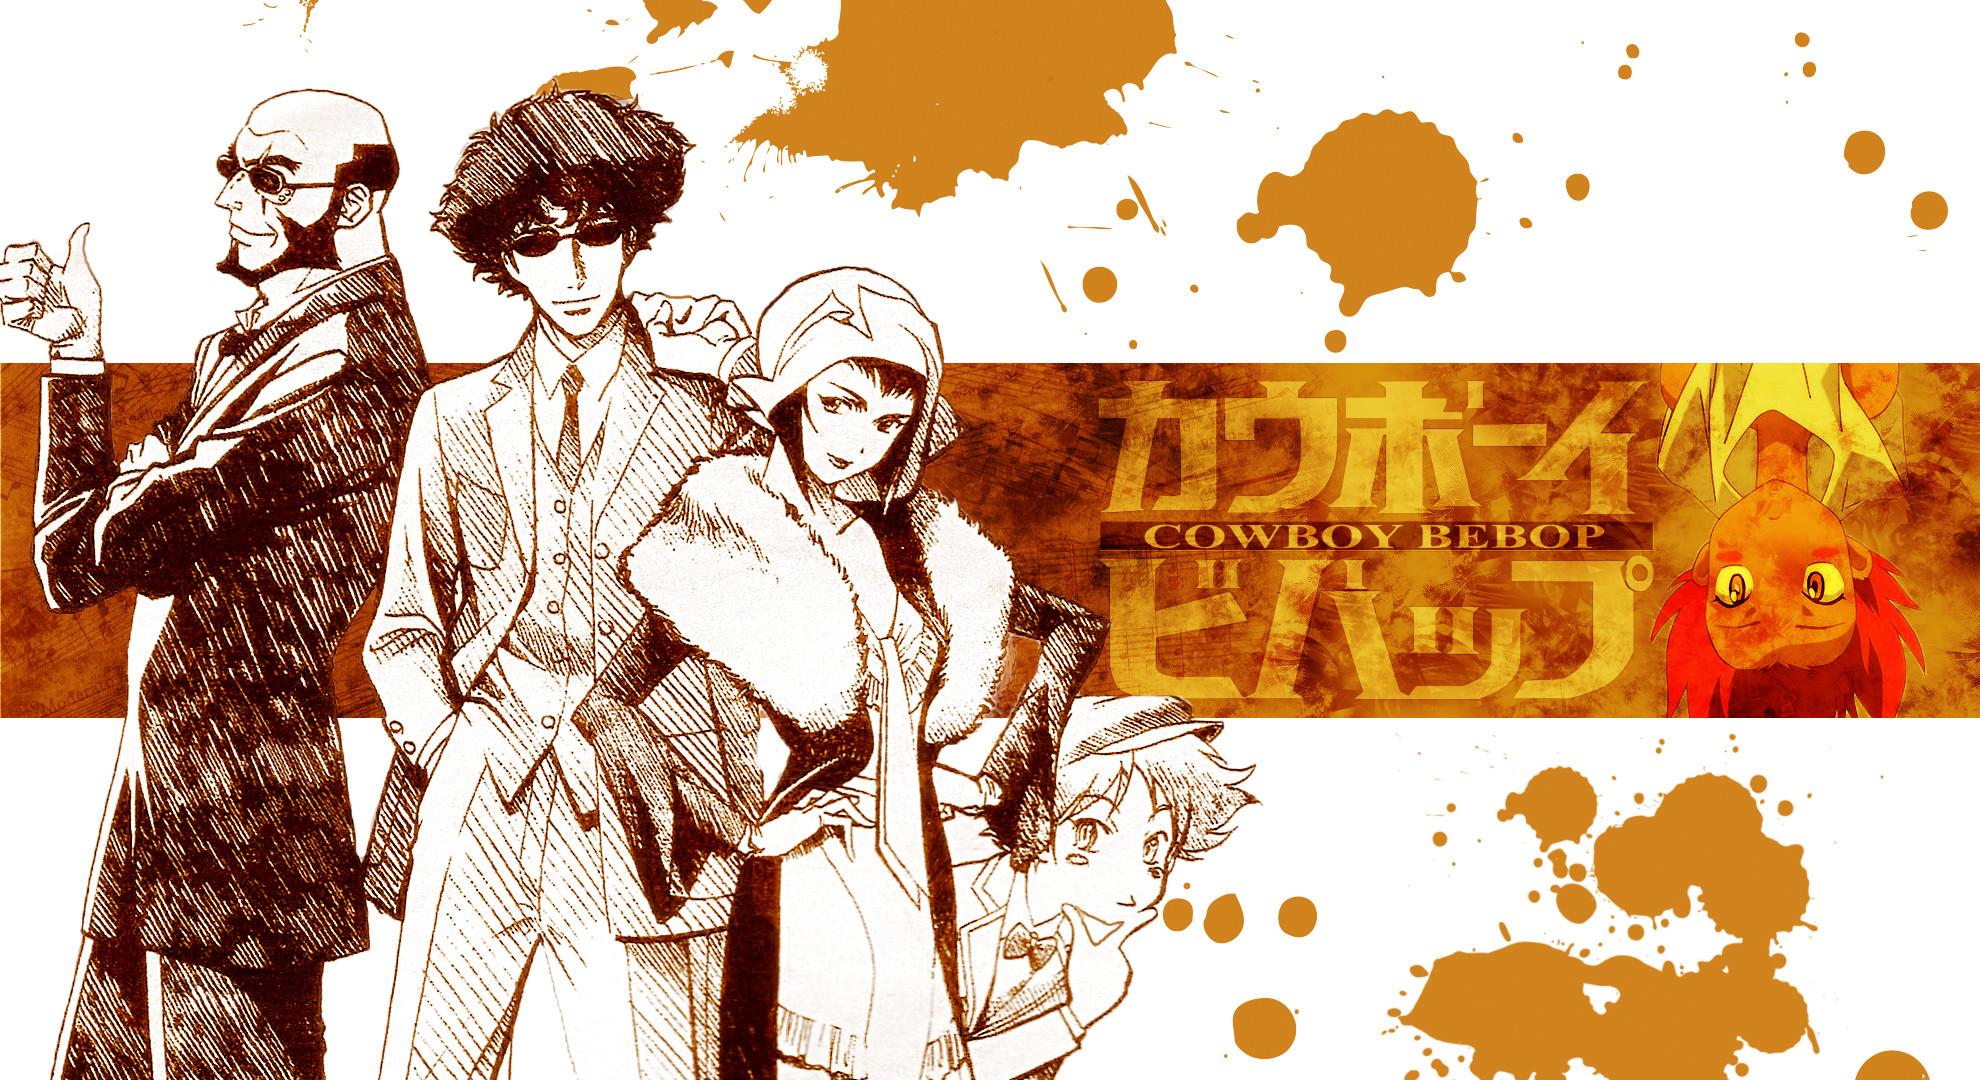 Cowboy Bebop Anime wallpapers. Cowboy Bebop Anime High quality wallpapers